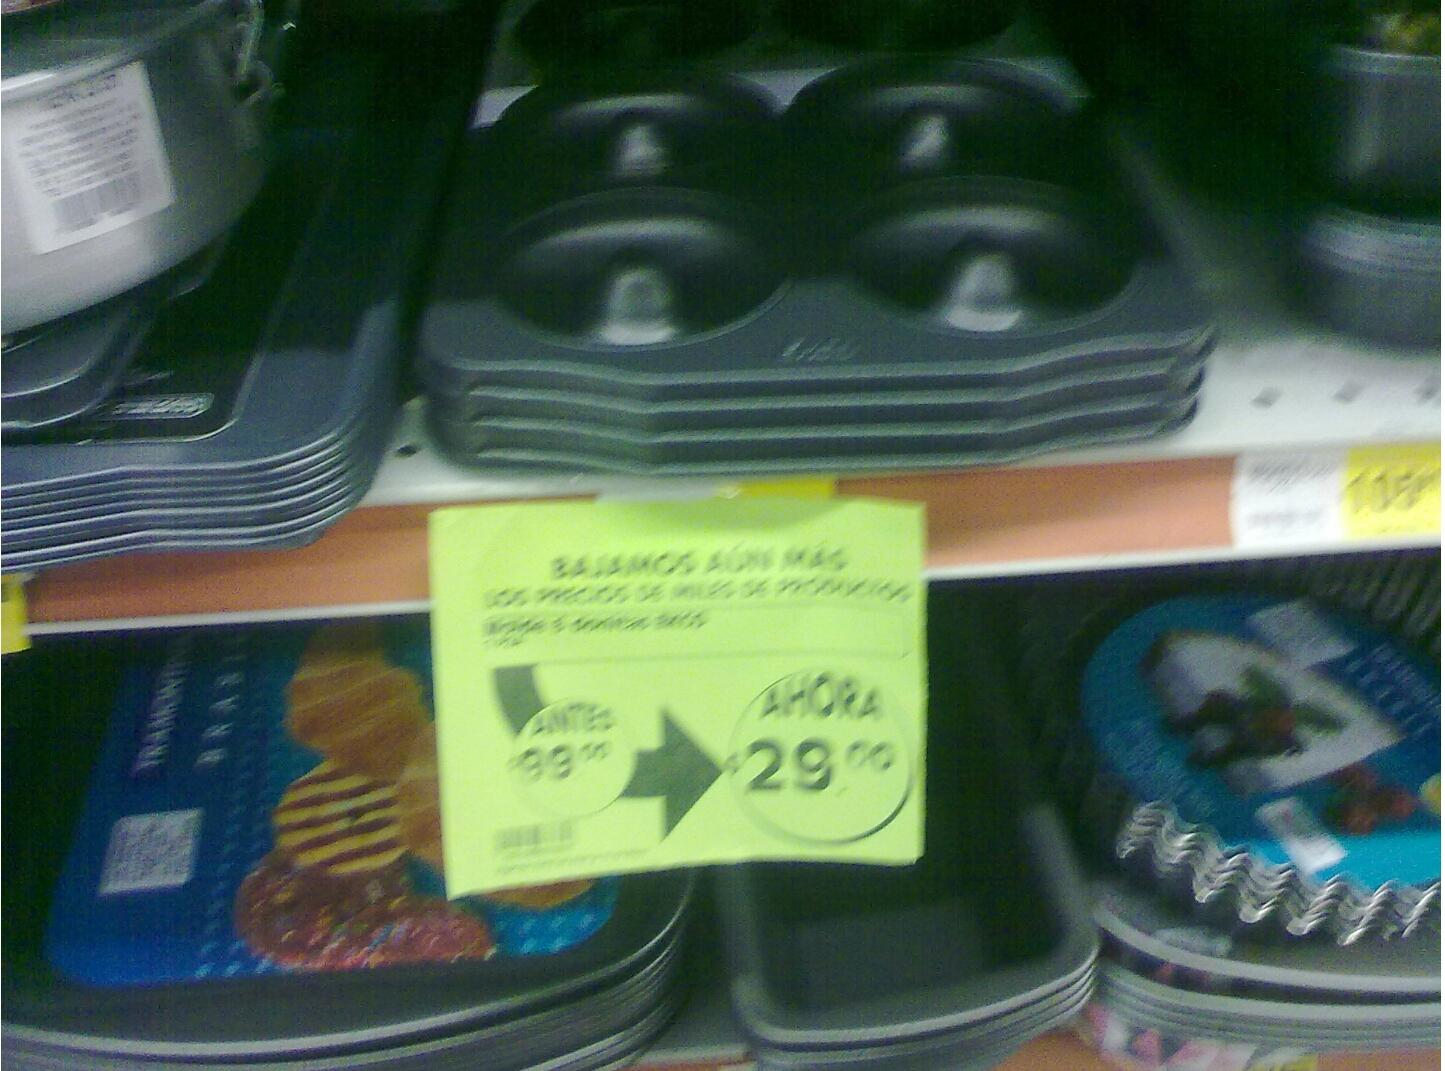 La Comer: Molde para donas marca Ekco de $99 a $29 pesos